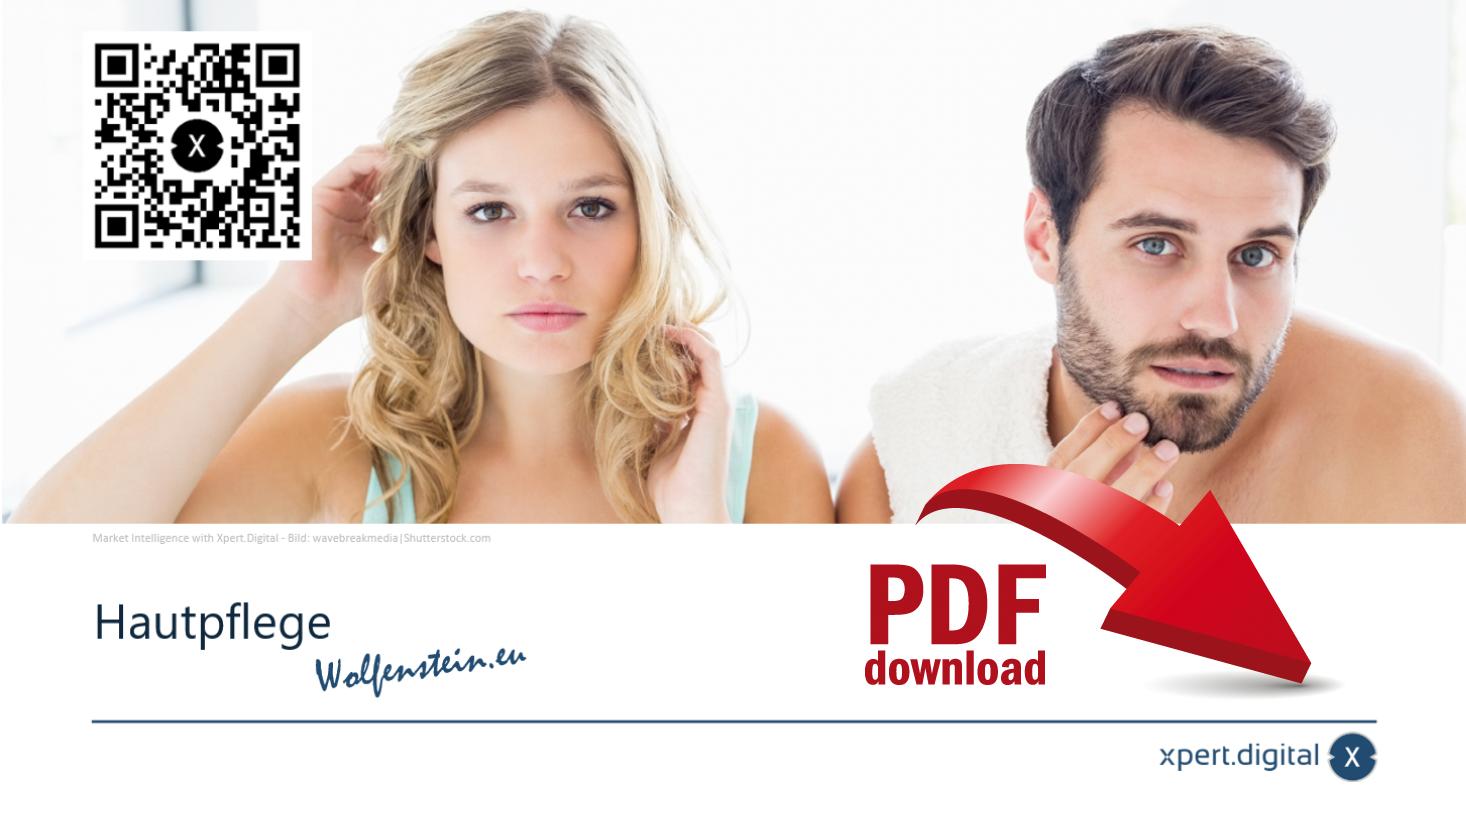 Hautpflege - PDF Download